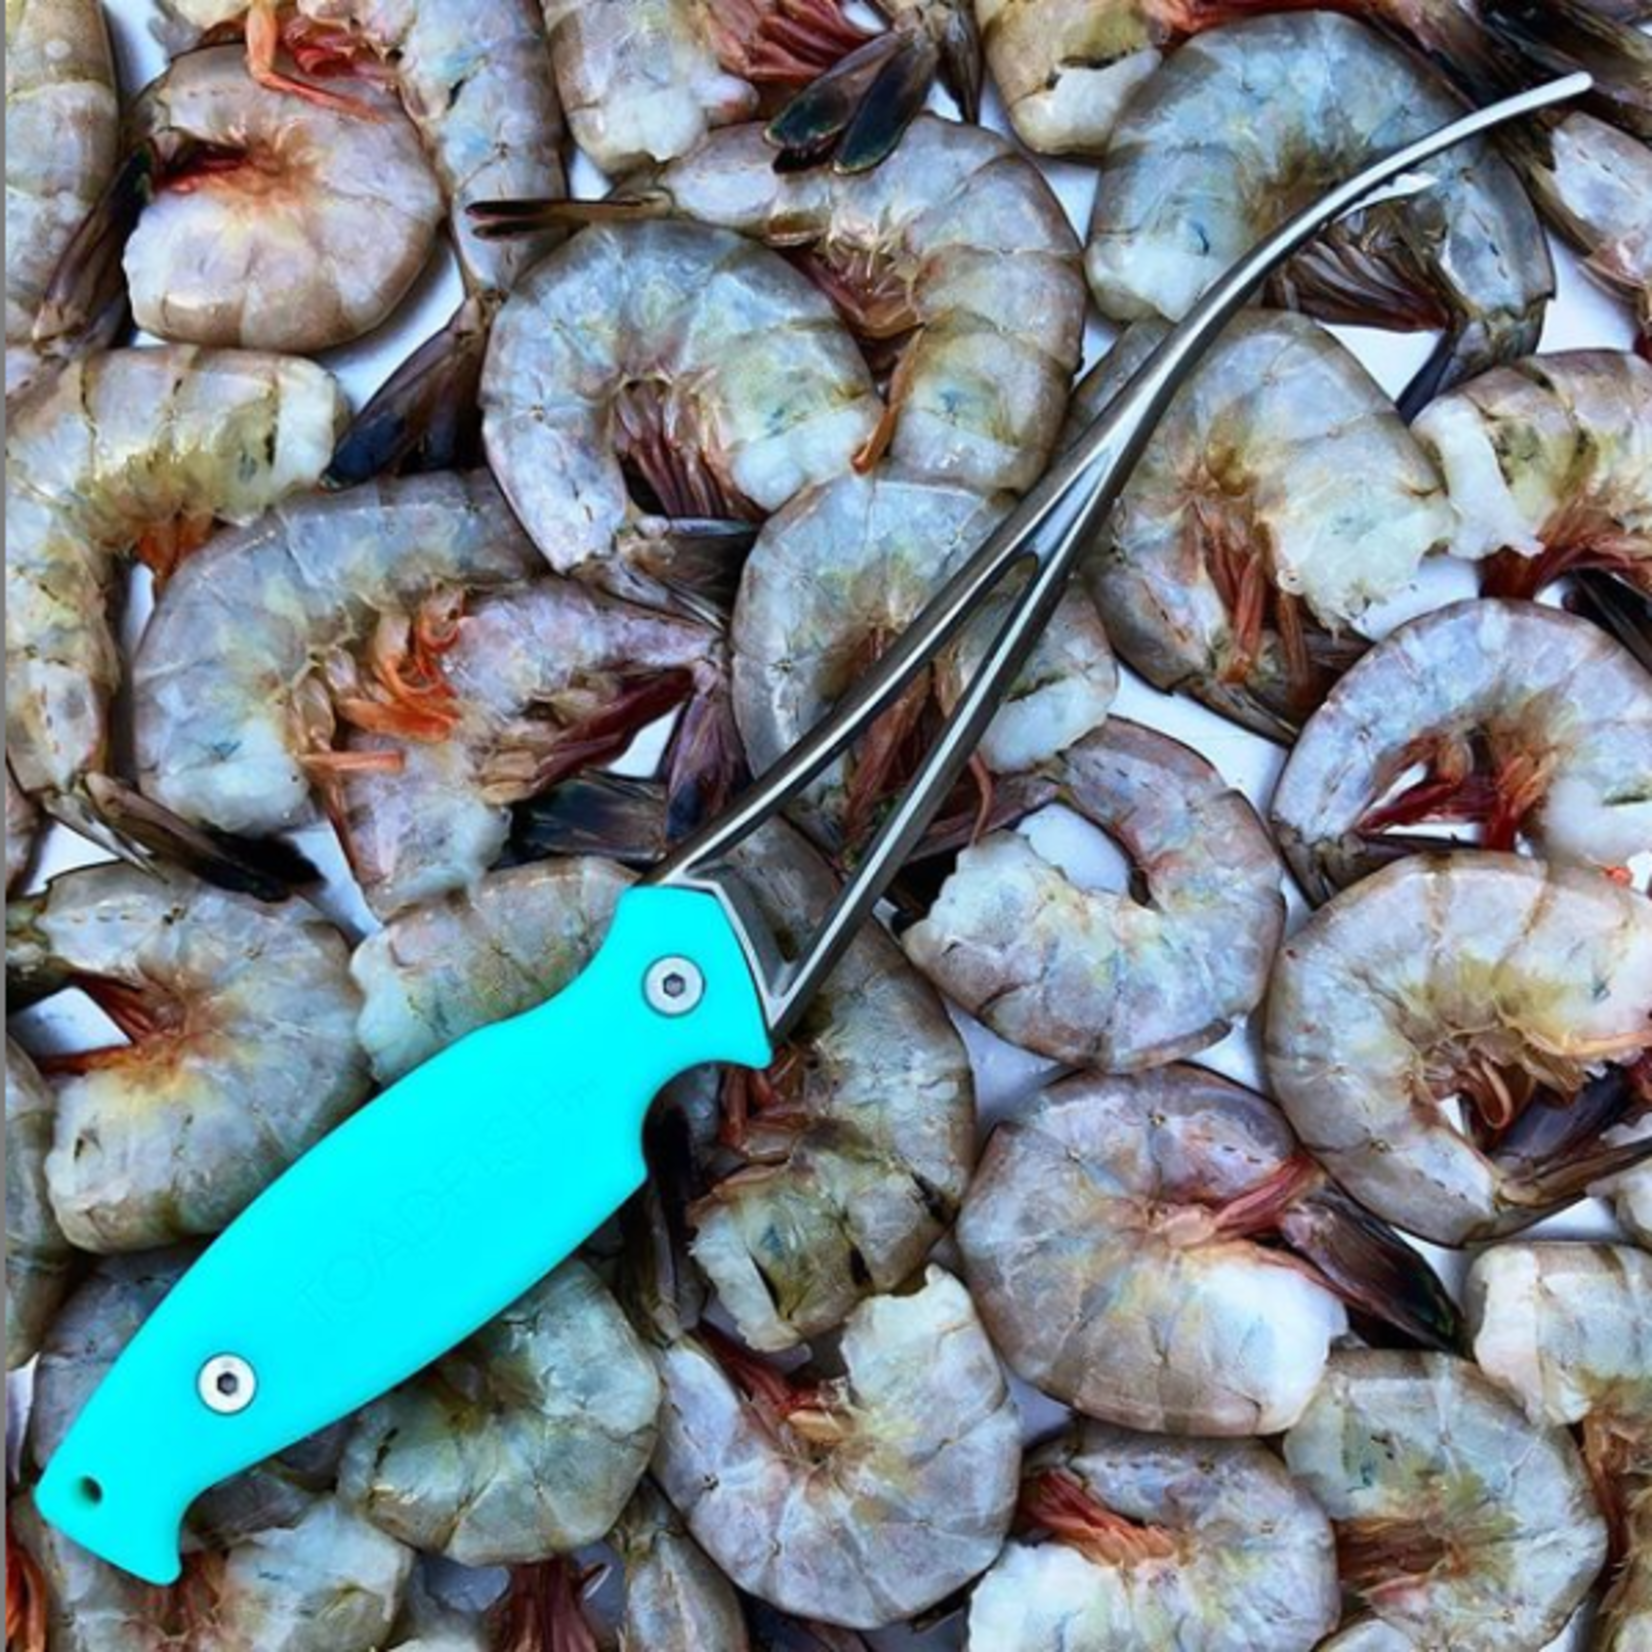 Sunjammers Toadfish Frogmore Shrimp Cleaner